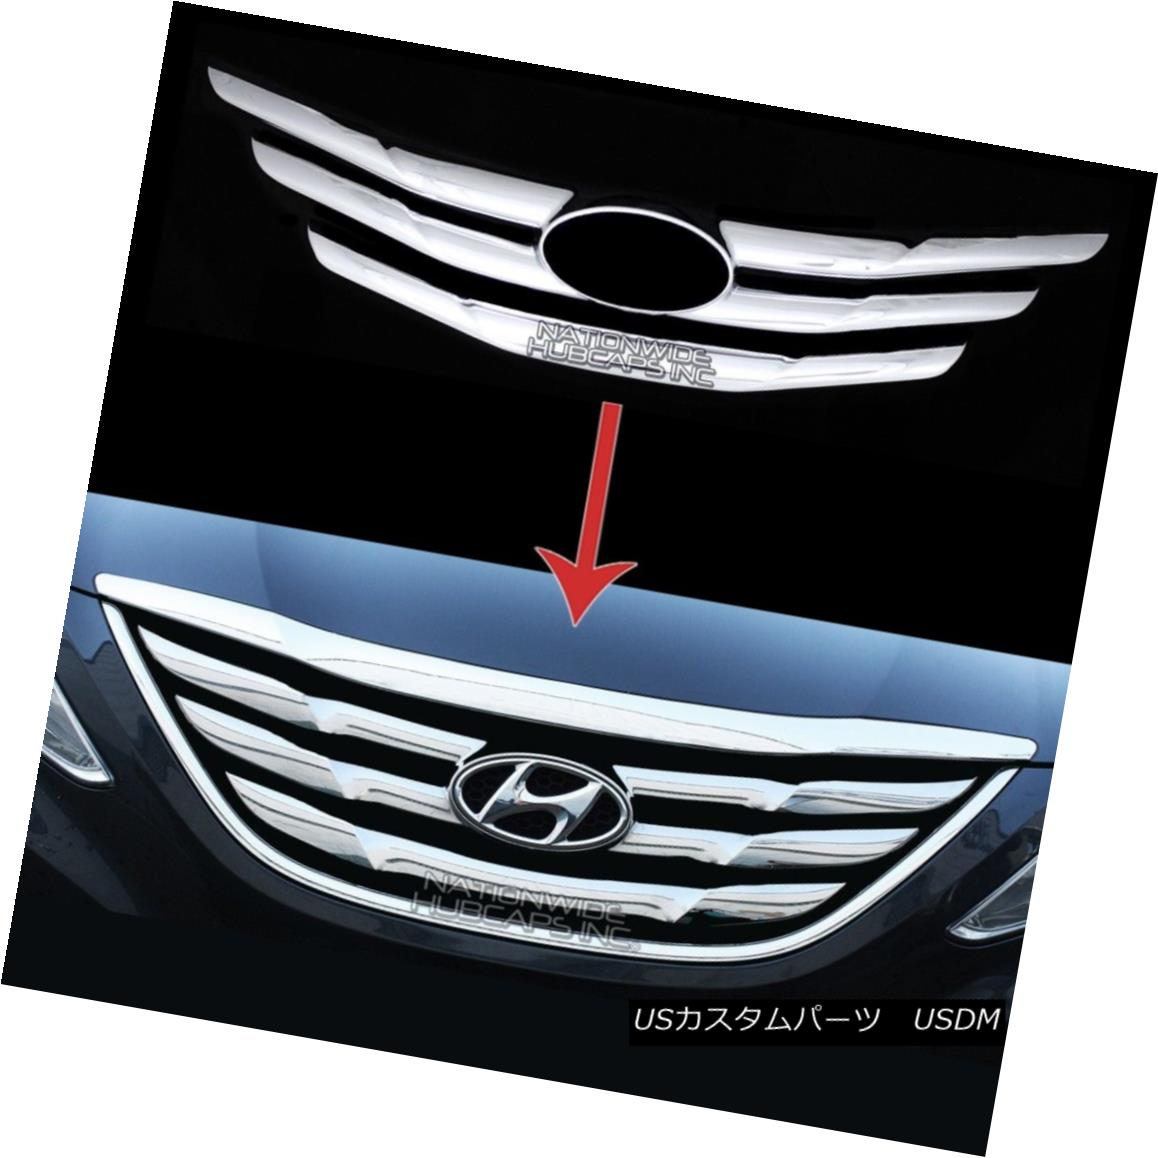 USグリル fits 11-13 Hyundai Sonata CHROME Snap On Grille Overlay Front Insert Grill Cover フィット11-13 Hyundai Sonata CHROMEスナップオングリルオーバーレイフロントインサートグリルカバー